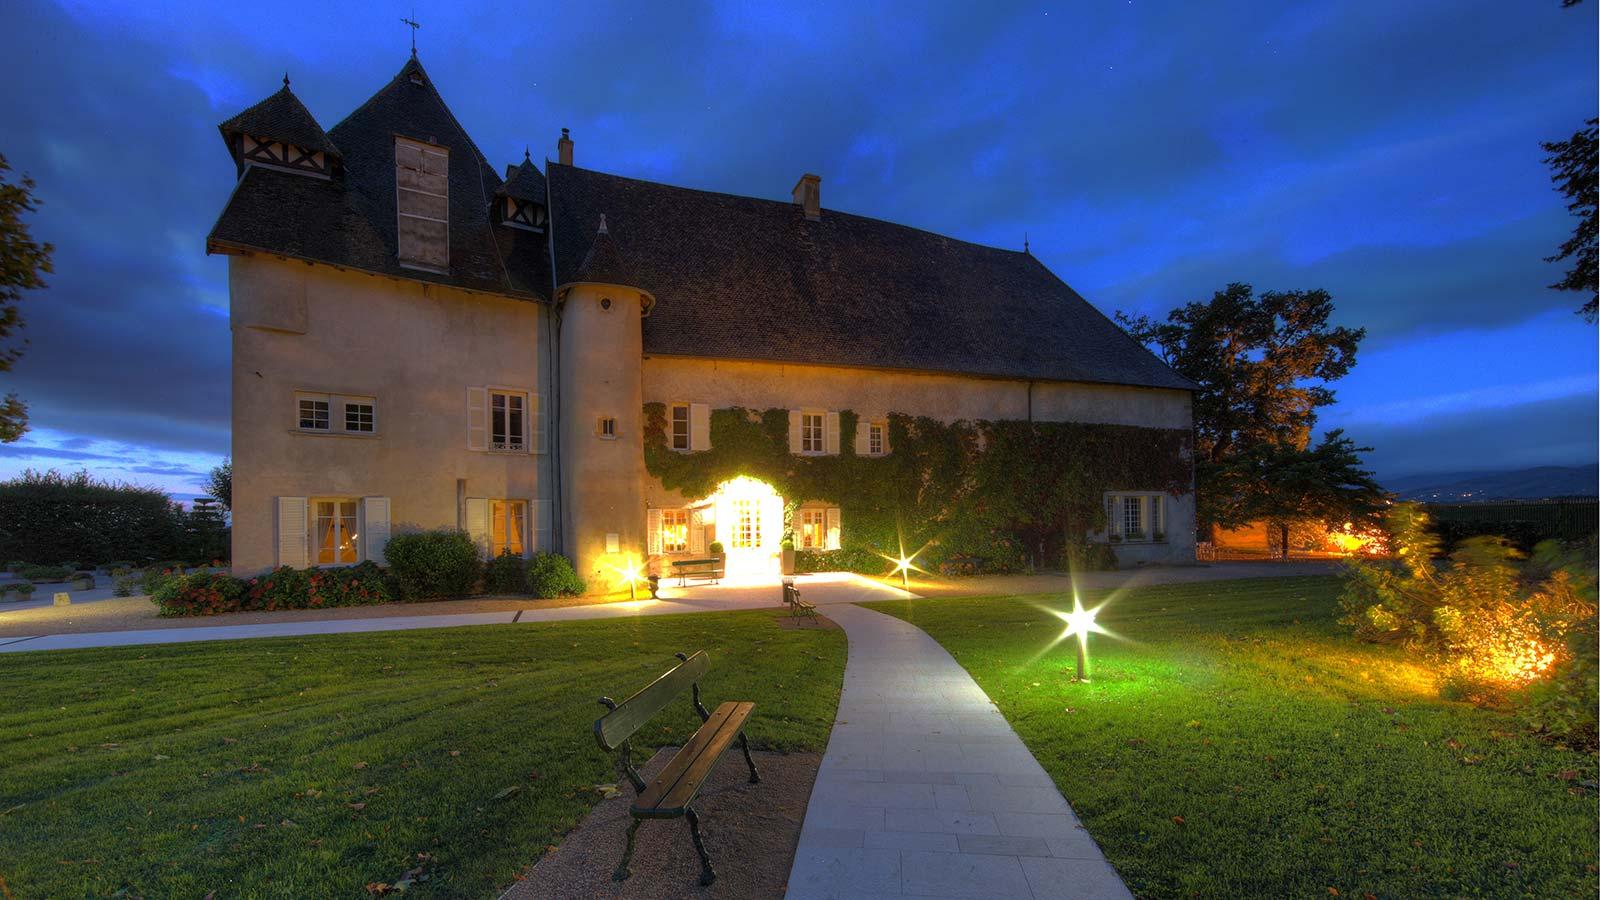 Salle château de Pizay beaujolais